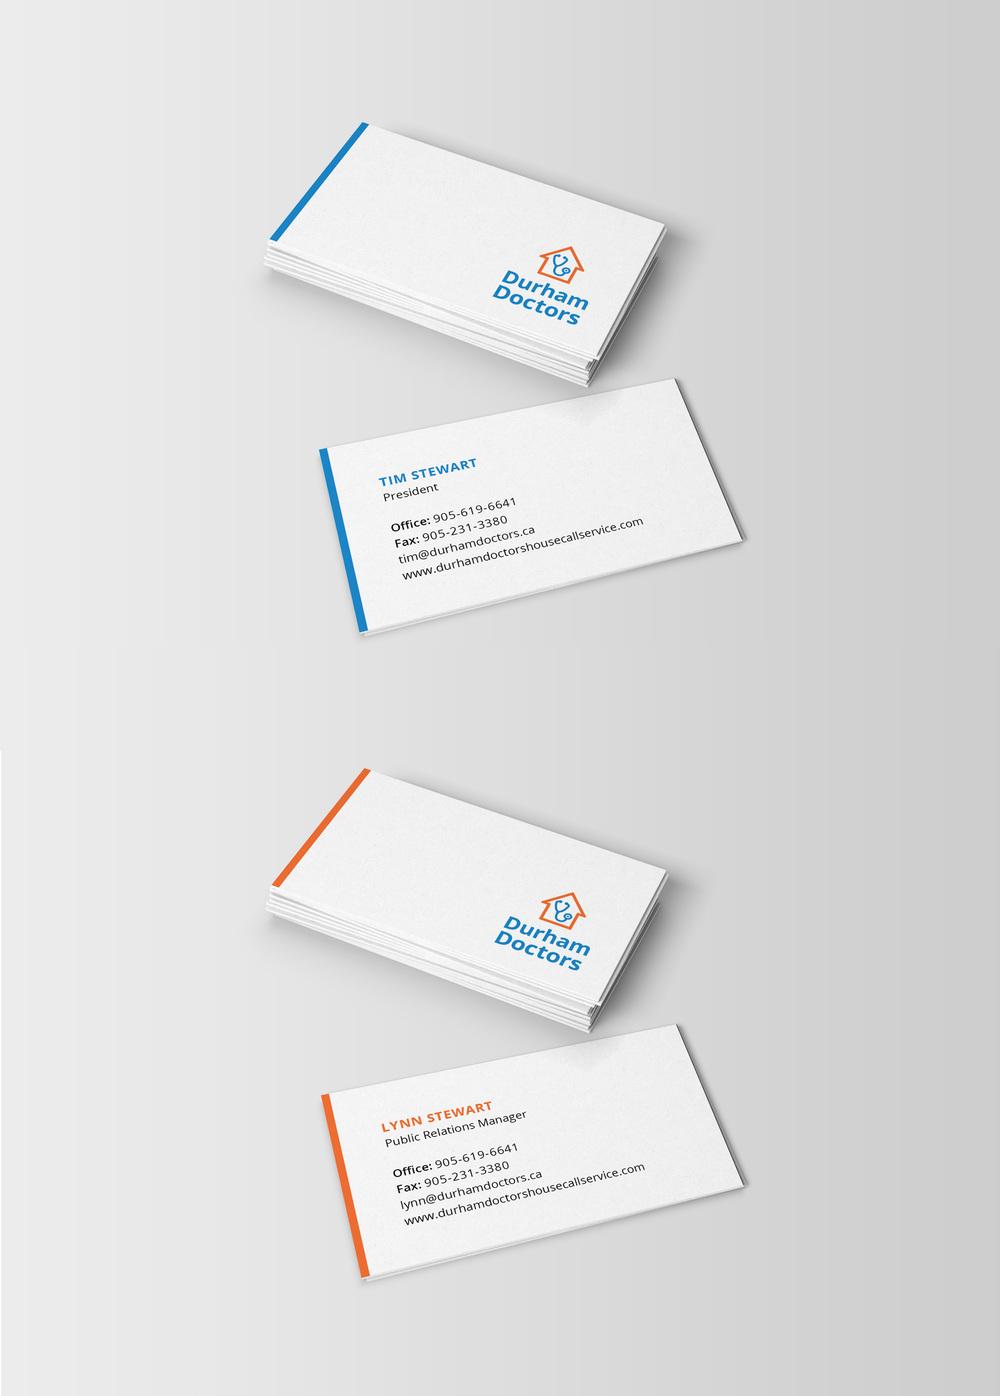 durhamdoctors_businesscard_mockup.jpg